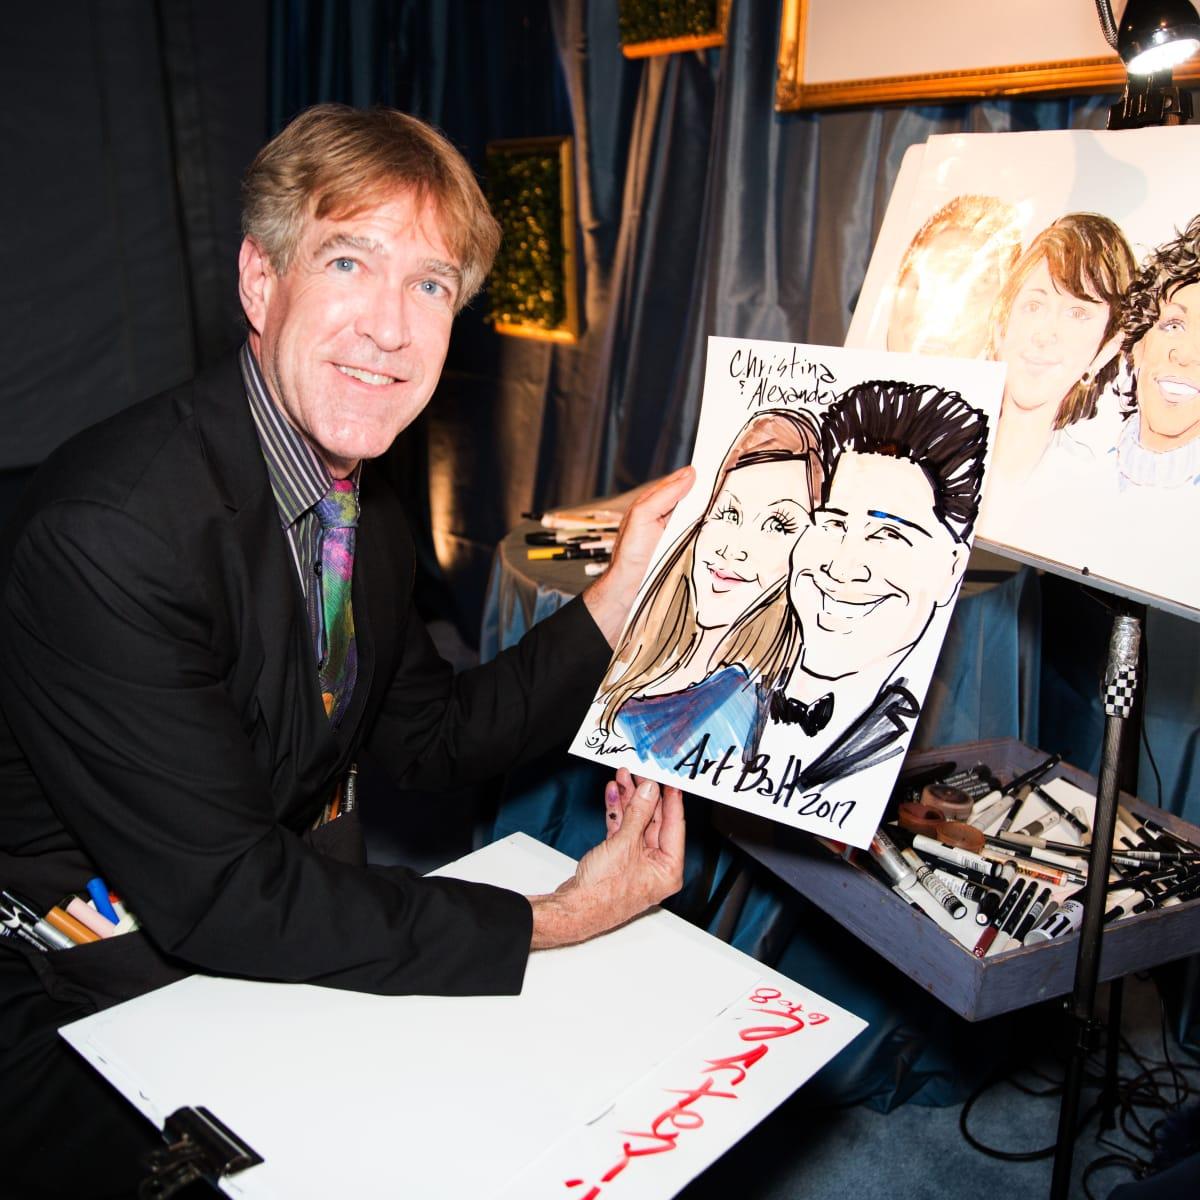 Caricature artist at Dallas Art Ball 2017